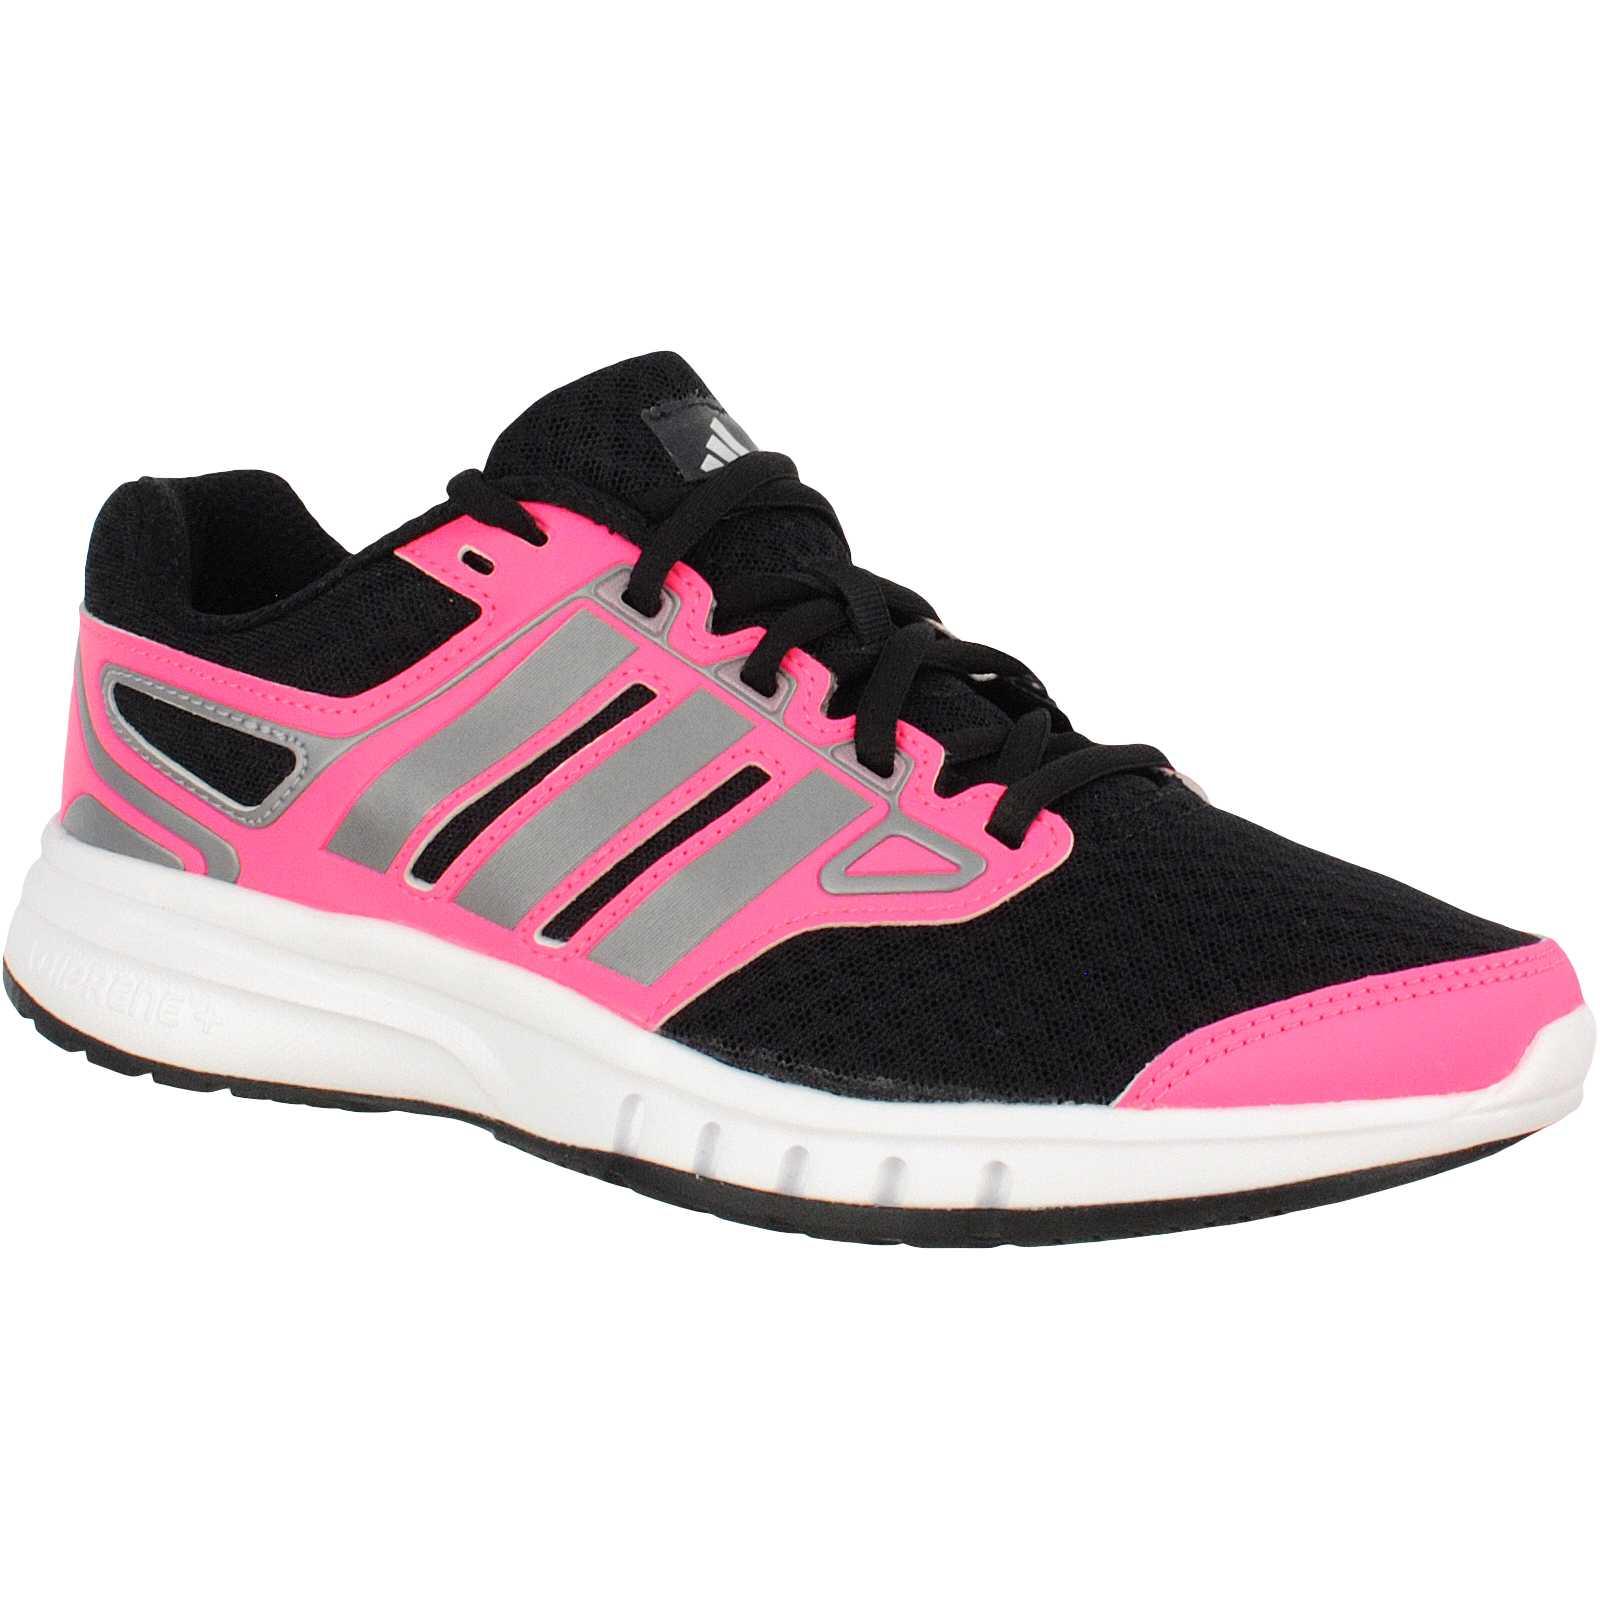 Pantofi sport femei adidas Galactic Elite B35854